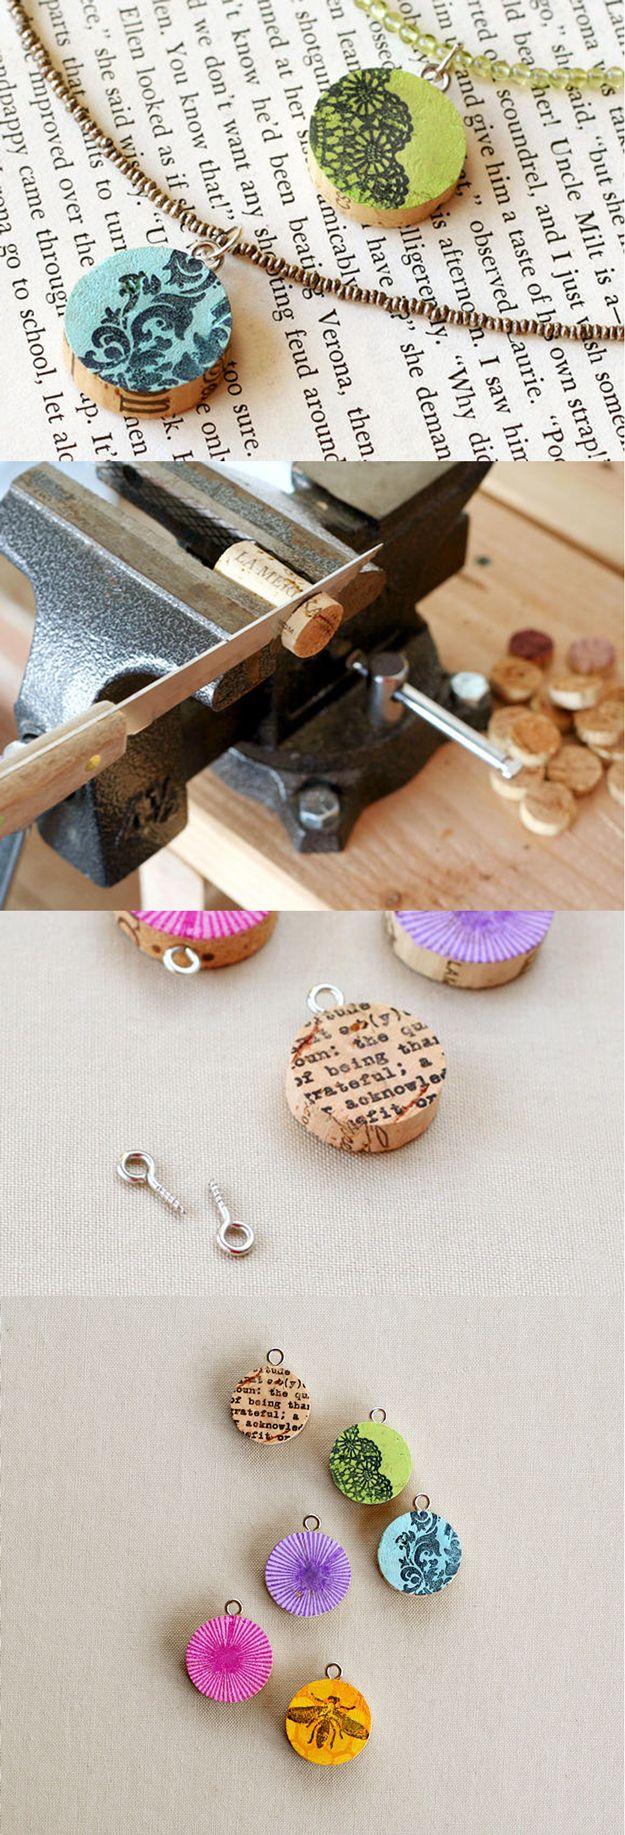 DIY Jewelry Ideas: Easy Wine Cork Pendants | DIY Wine Cork Jewelry for Teens by DIY Ready at http://diyready.com/more-wine-cork-crafts-ideas/